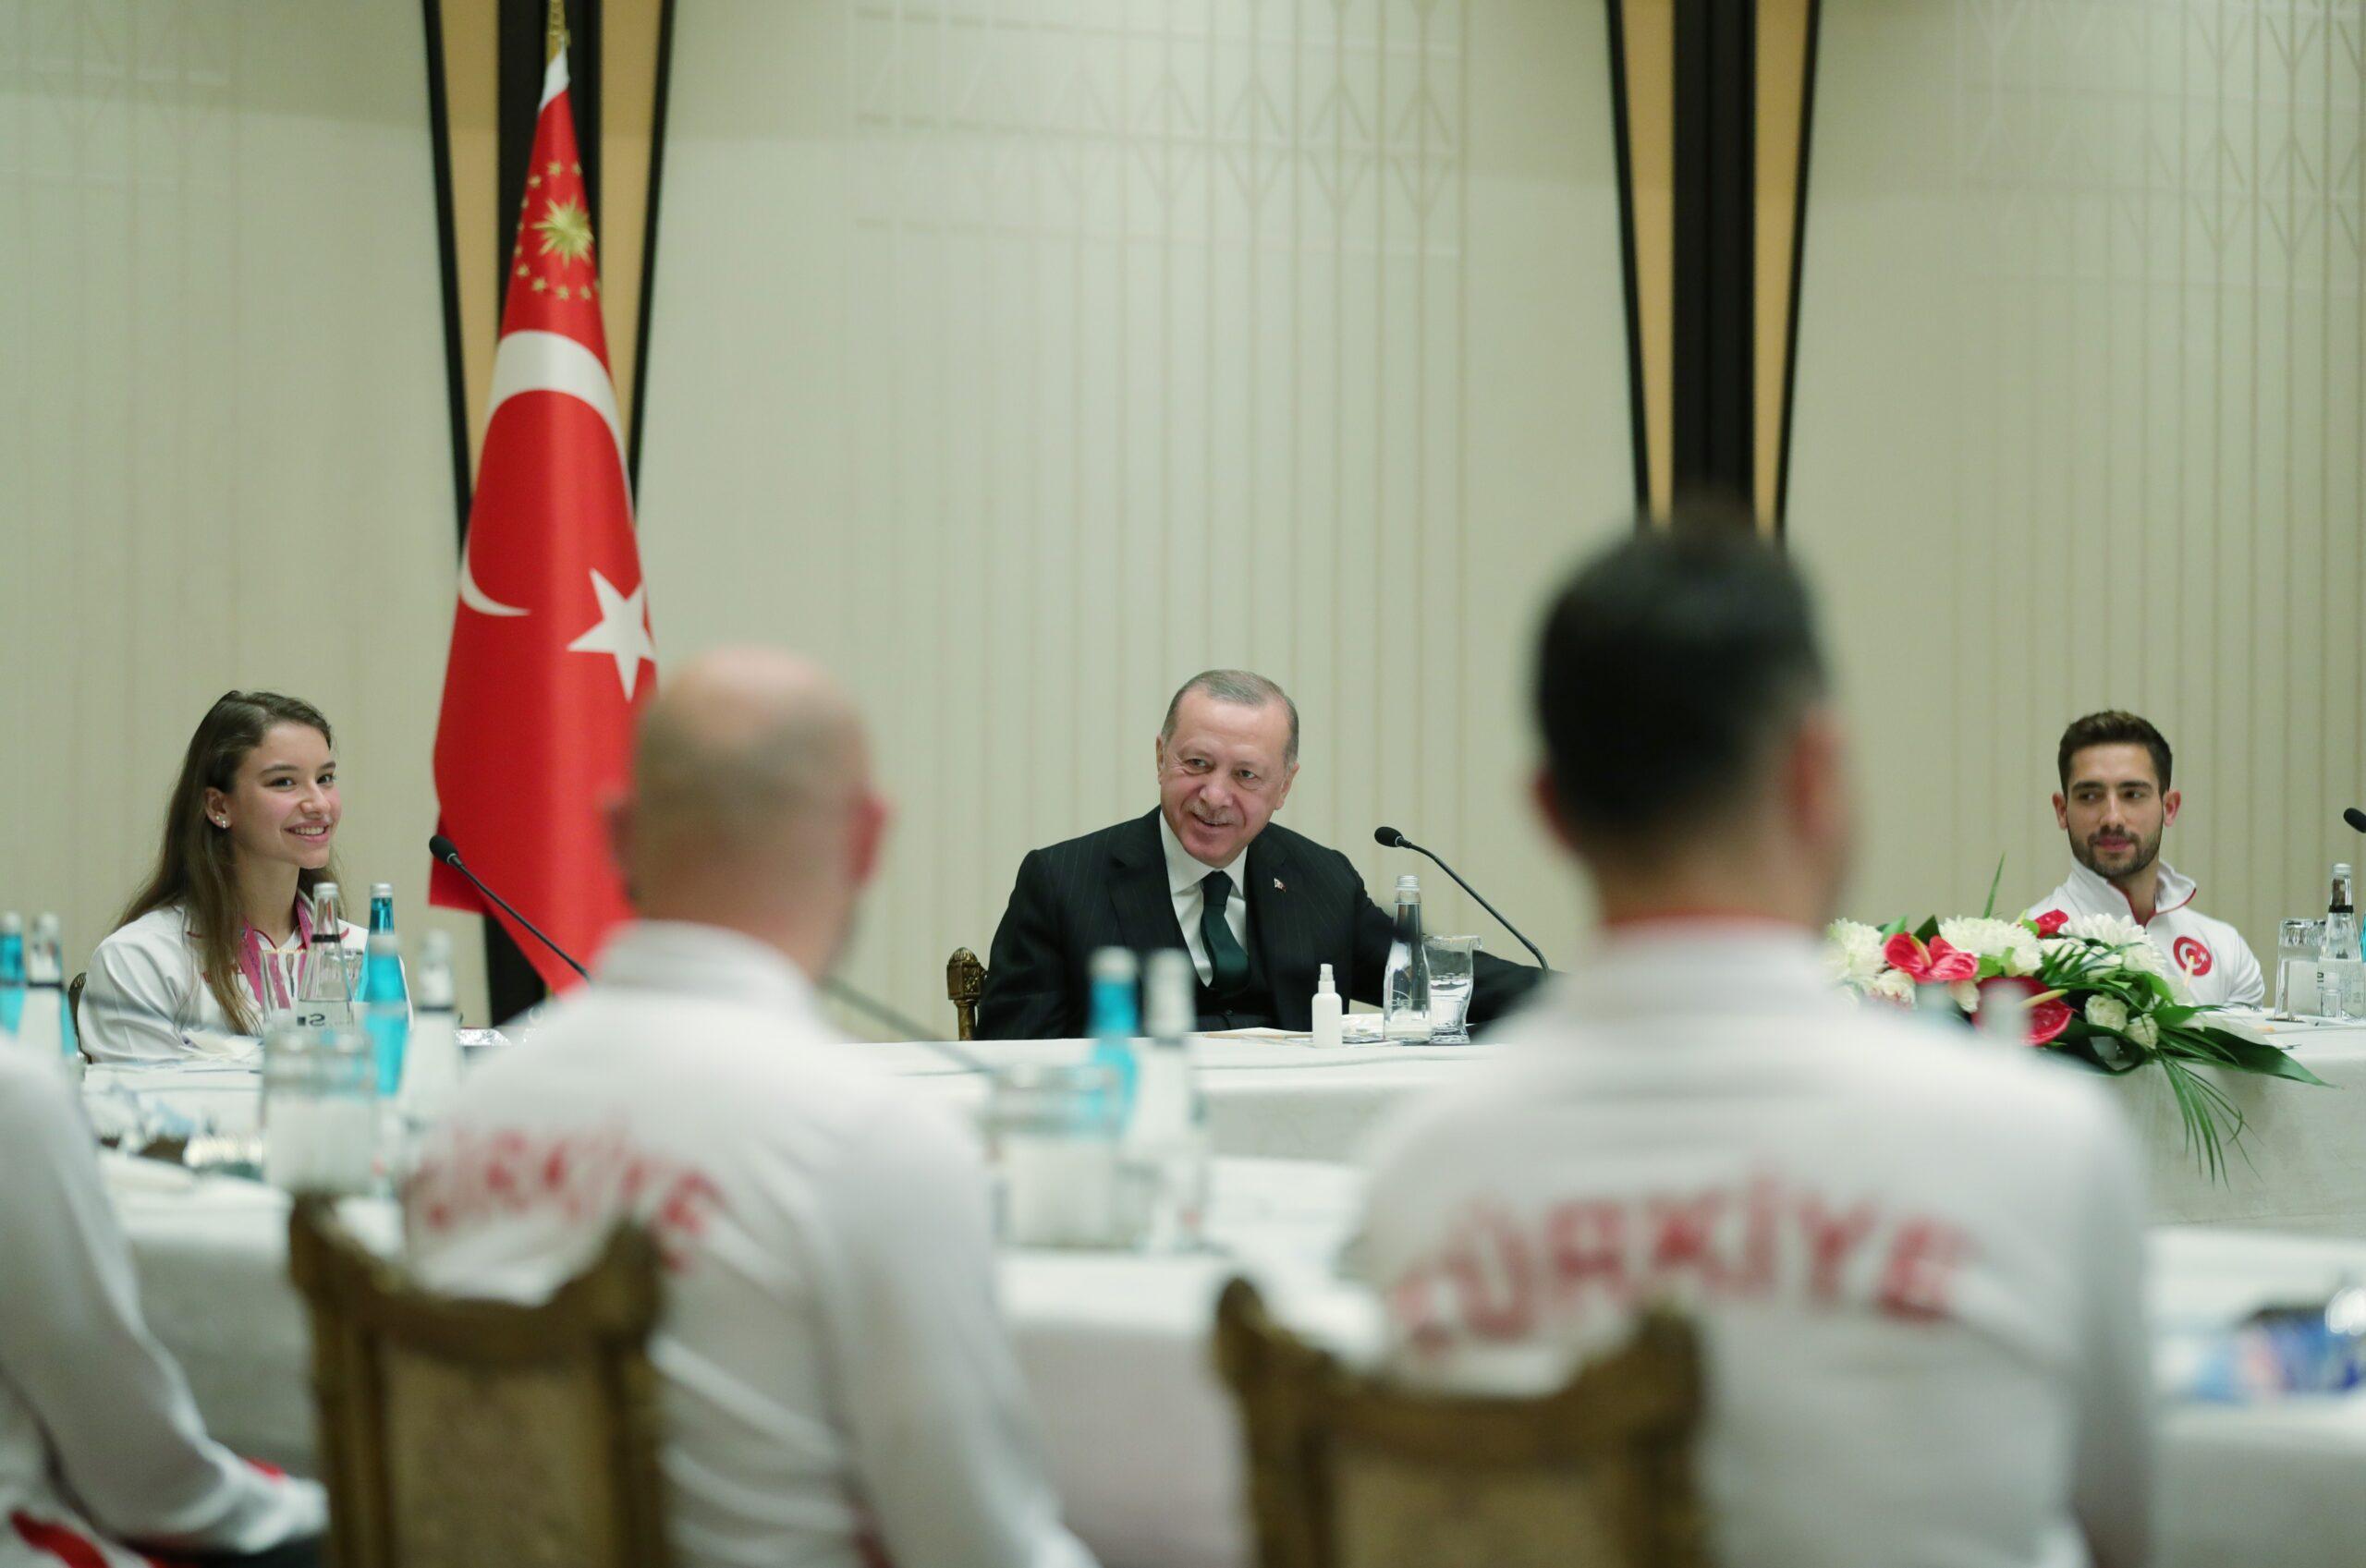 cumhurbaskani-erdogan-milli-sporculari-kabul-etti-60b7cc22e6176